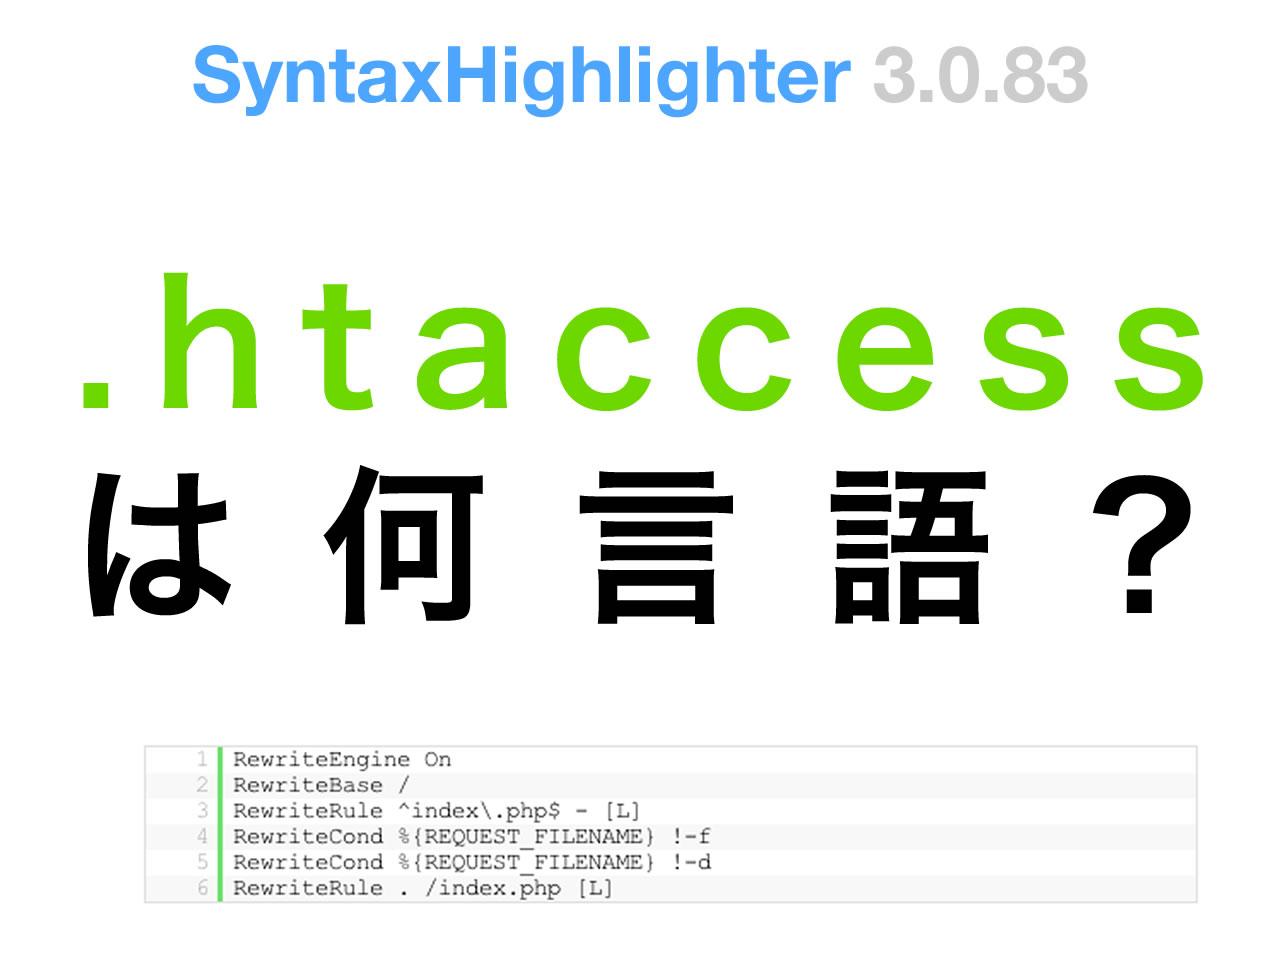 SyntaxHighlighterで.htaccessの場合の言語は何?   トラブルシューティング